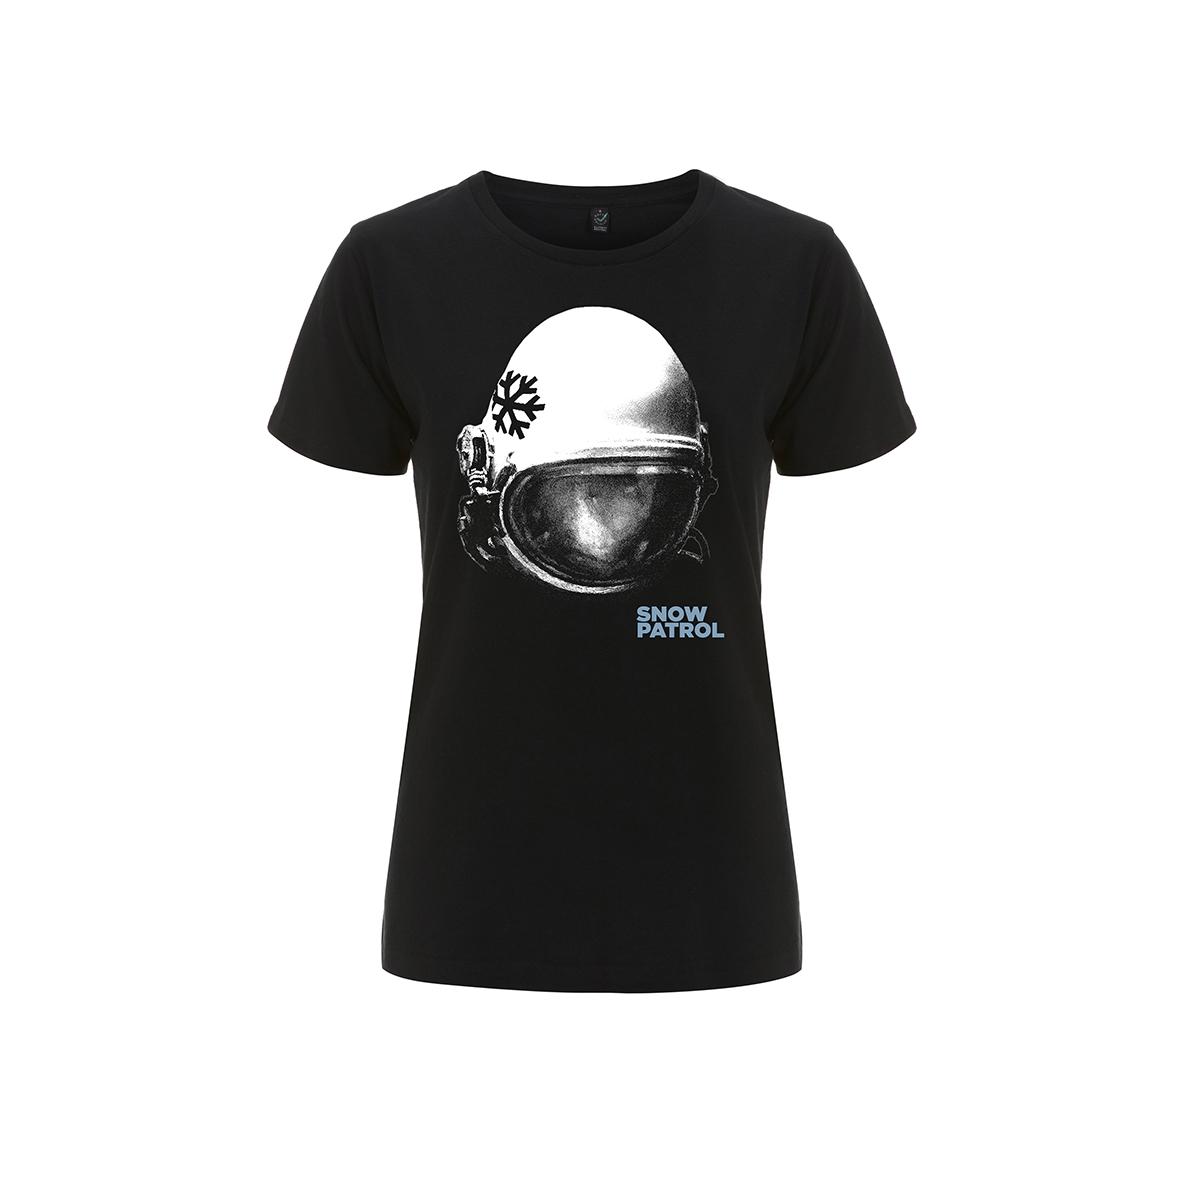 Helmet Black Ladies Tee - Snow Patrol